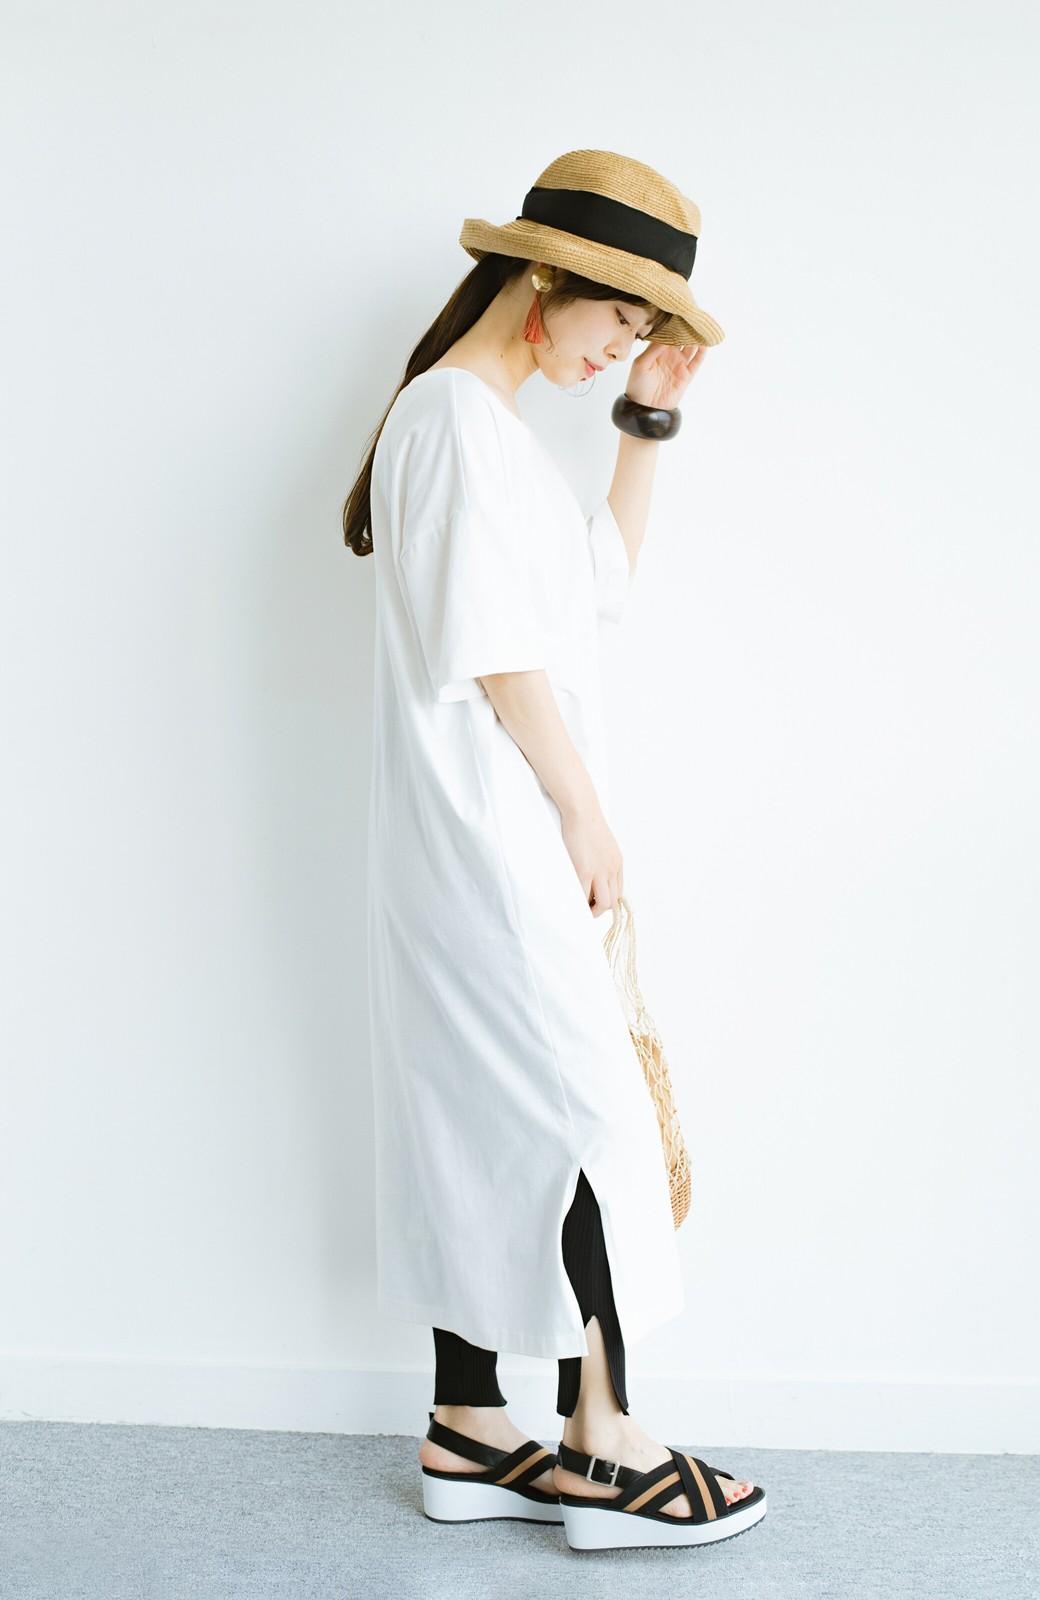 haco! 【ずぼら党】すぽっと着るだけ即完成! ずぼらさんのための気取らず着られて洗濯機洗いできるワンピ2枚セット <ホワイト×ネイビー>の商品写真16